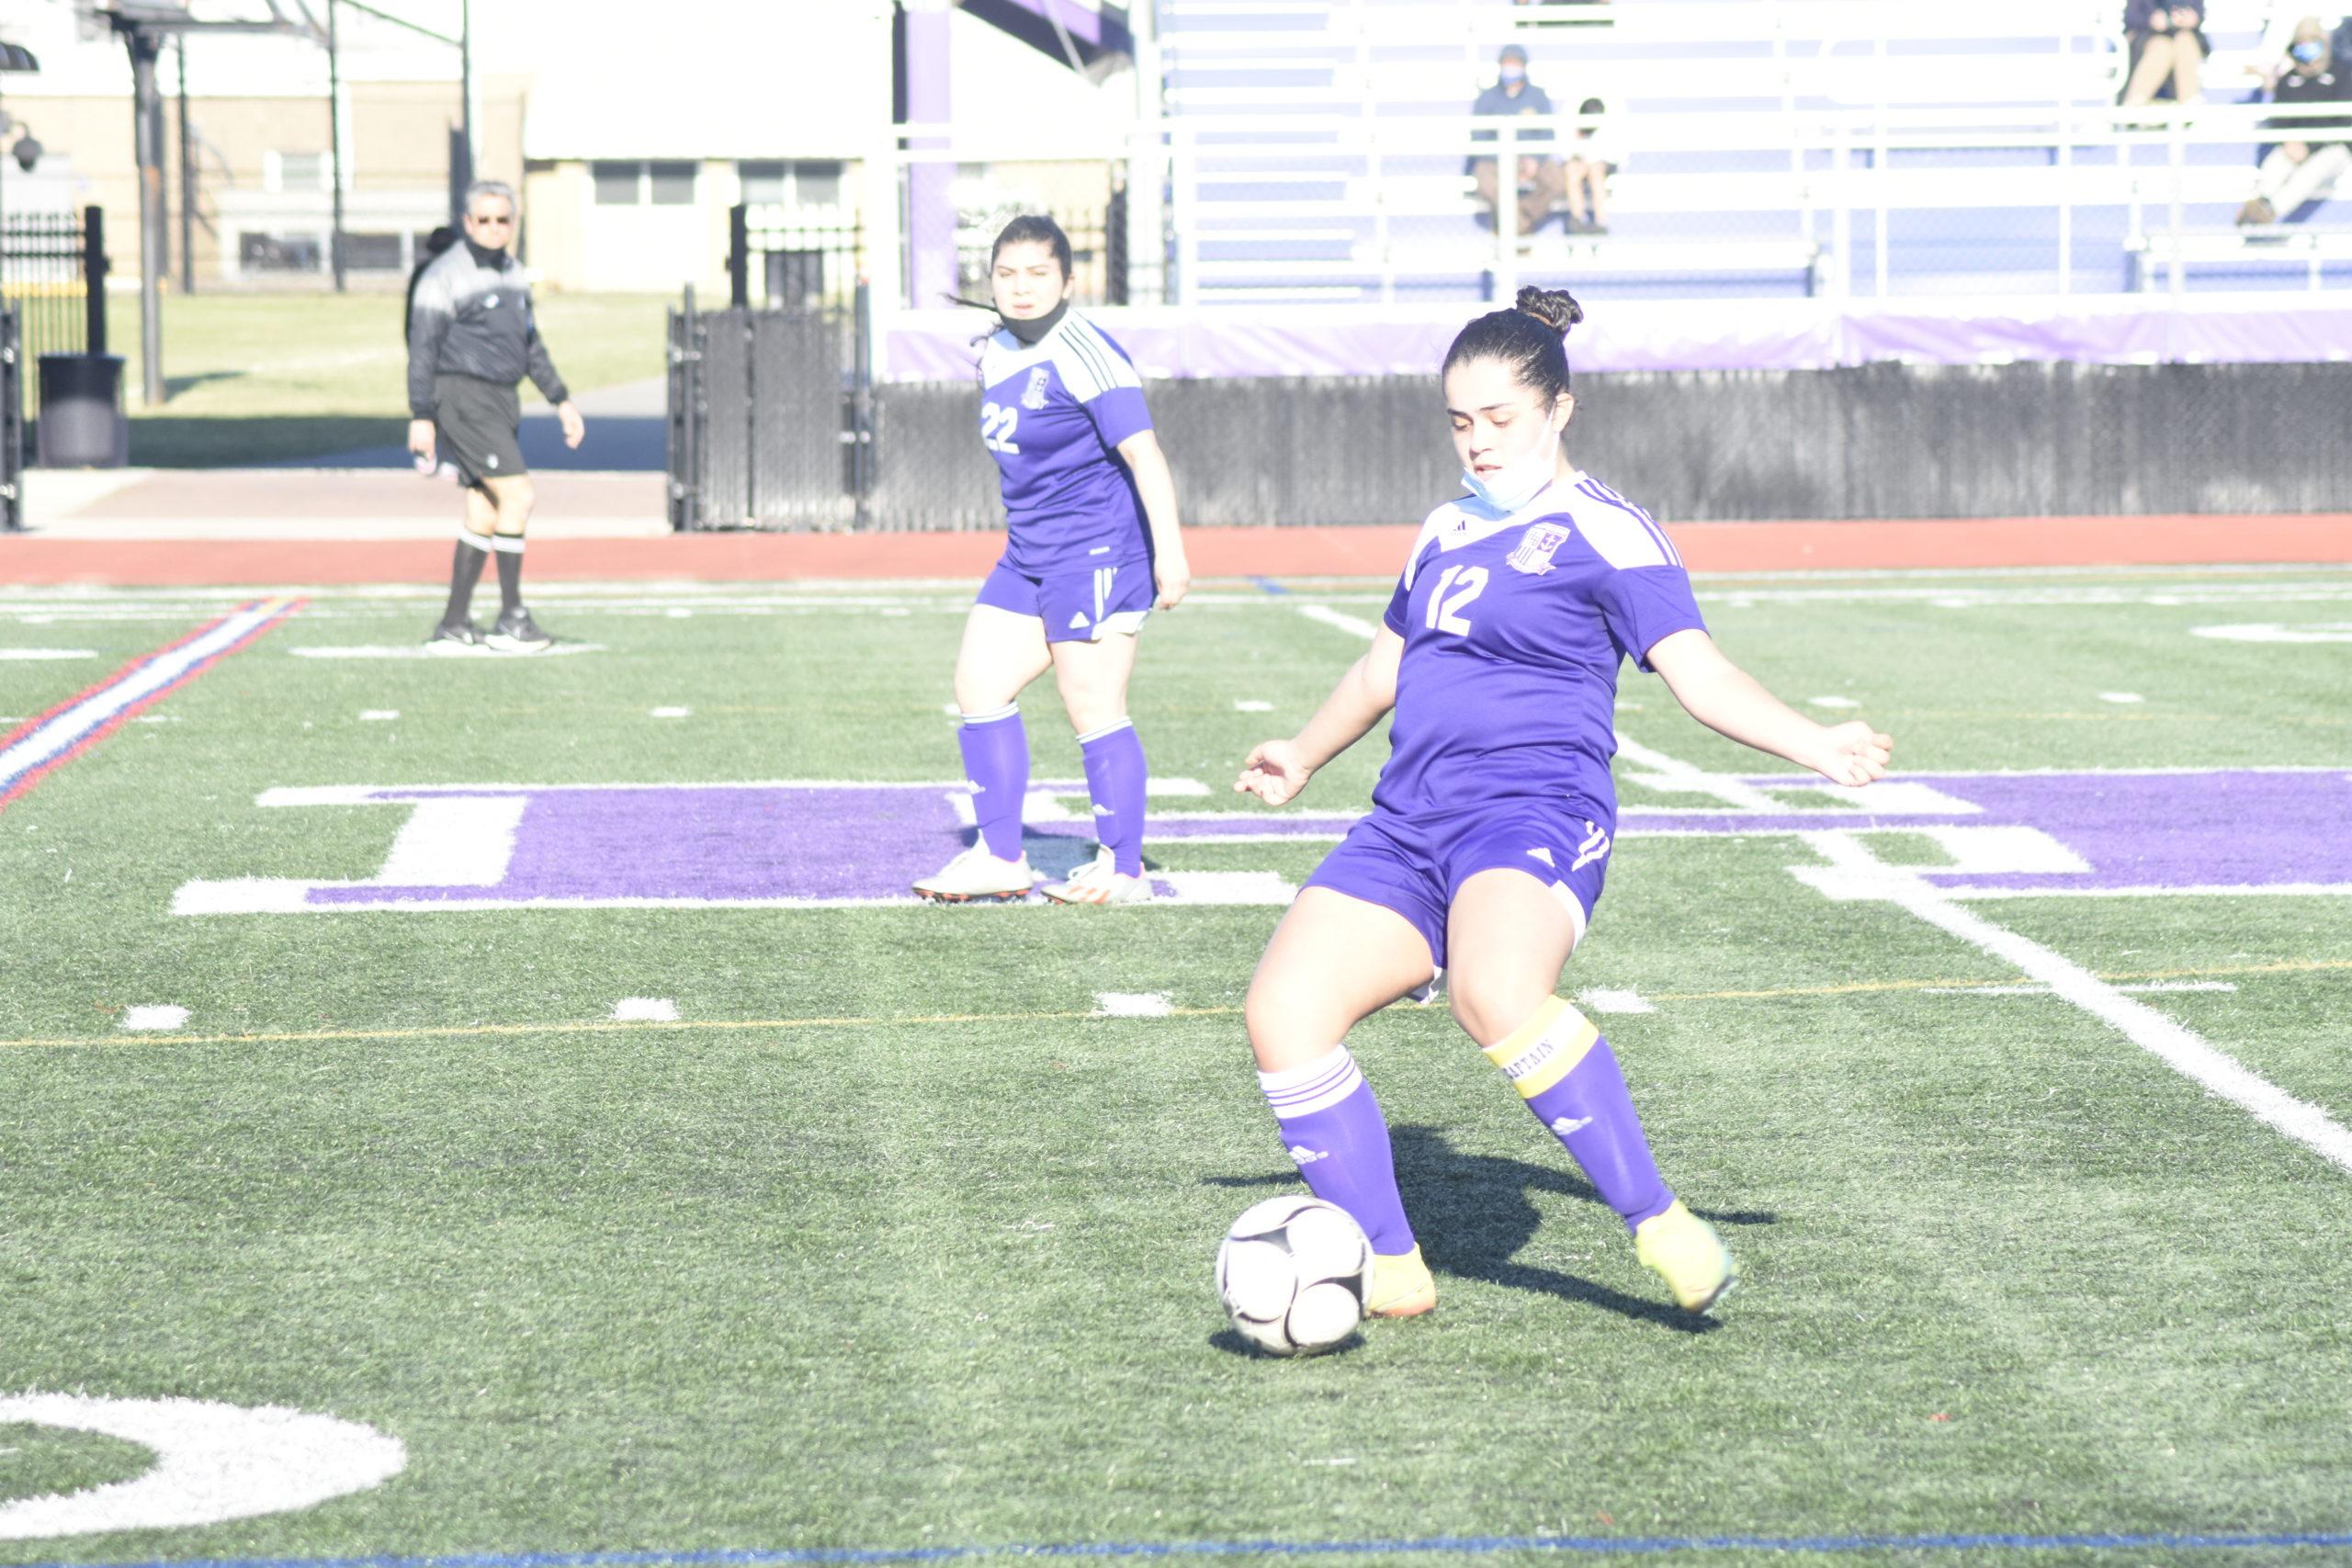 Hampton Bays senior tri-captain Stephanie Alvarez sends the ball upfield.